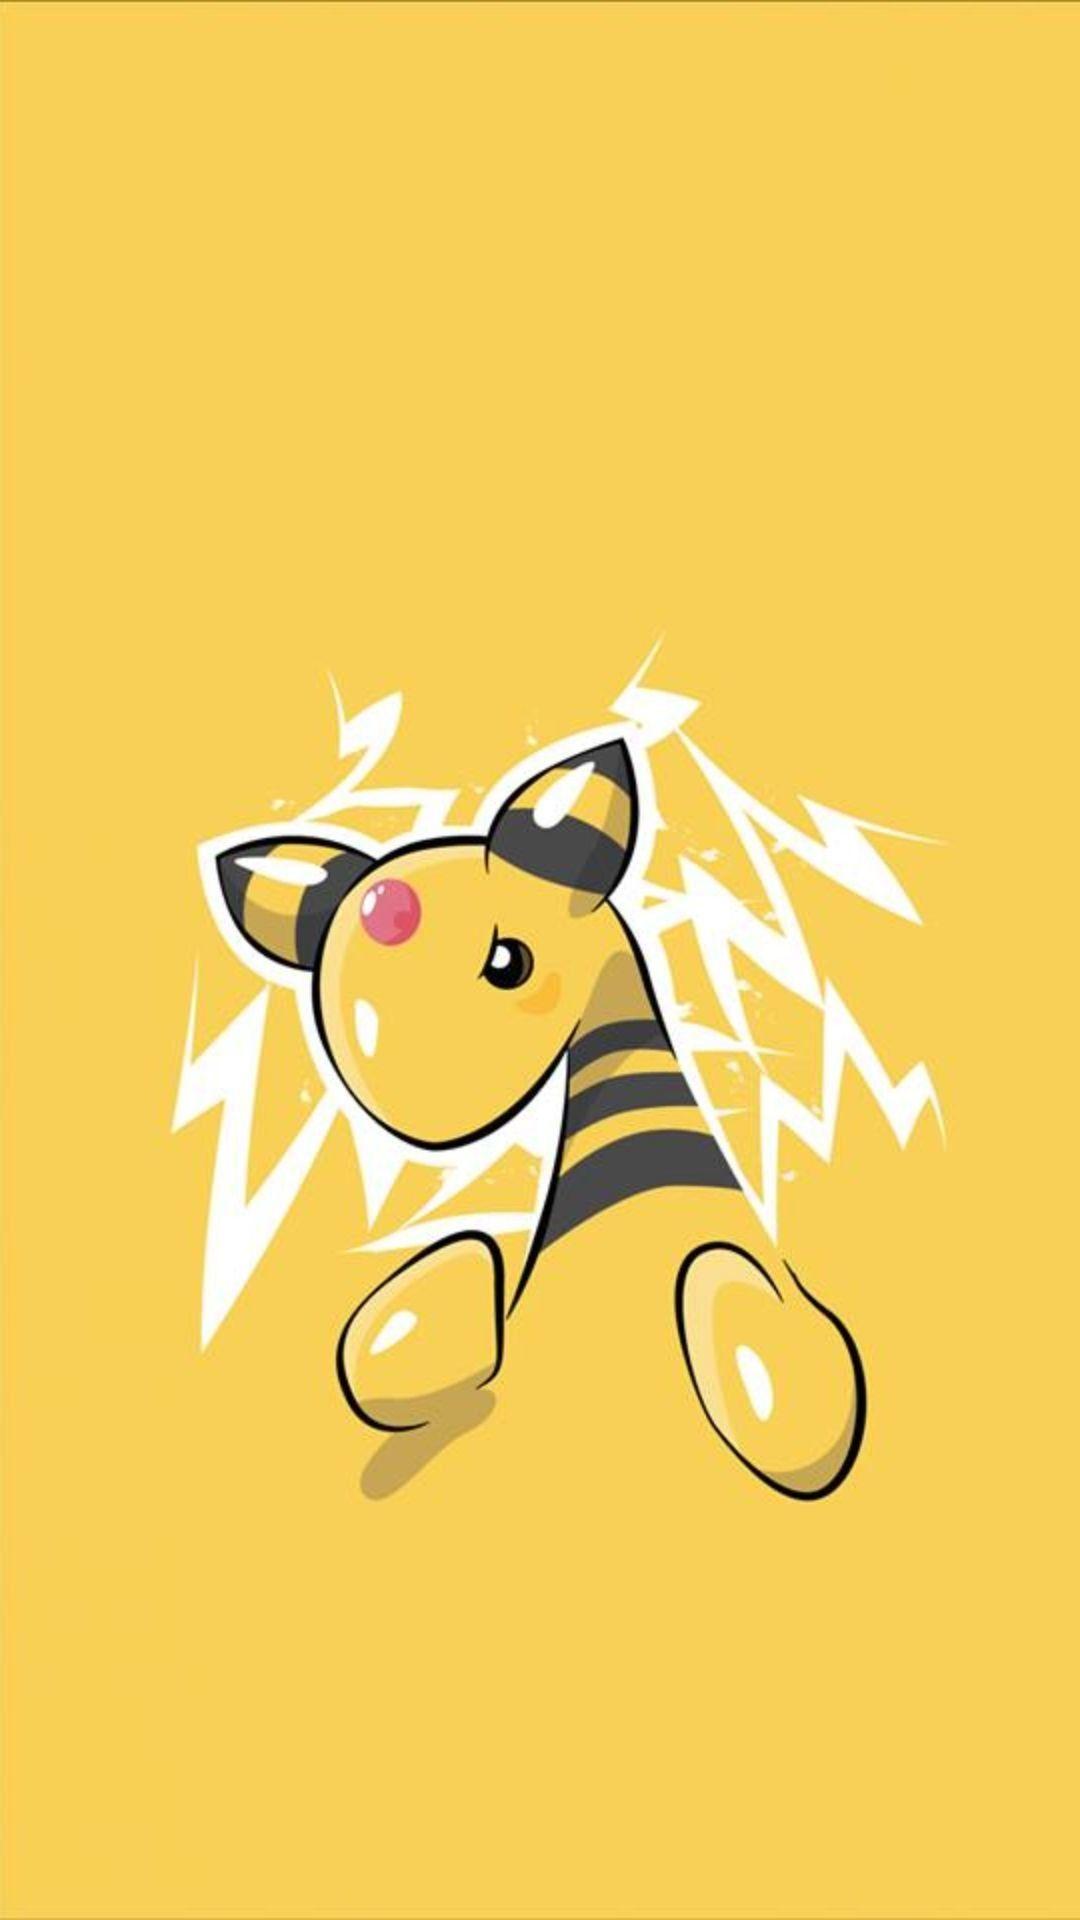 Pokemon Minimalist iPhone xr wallpaper